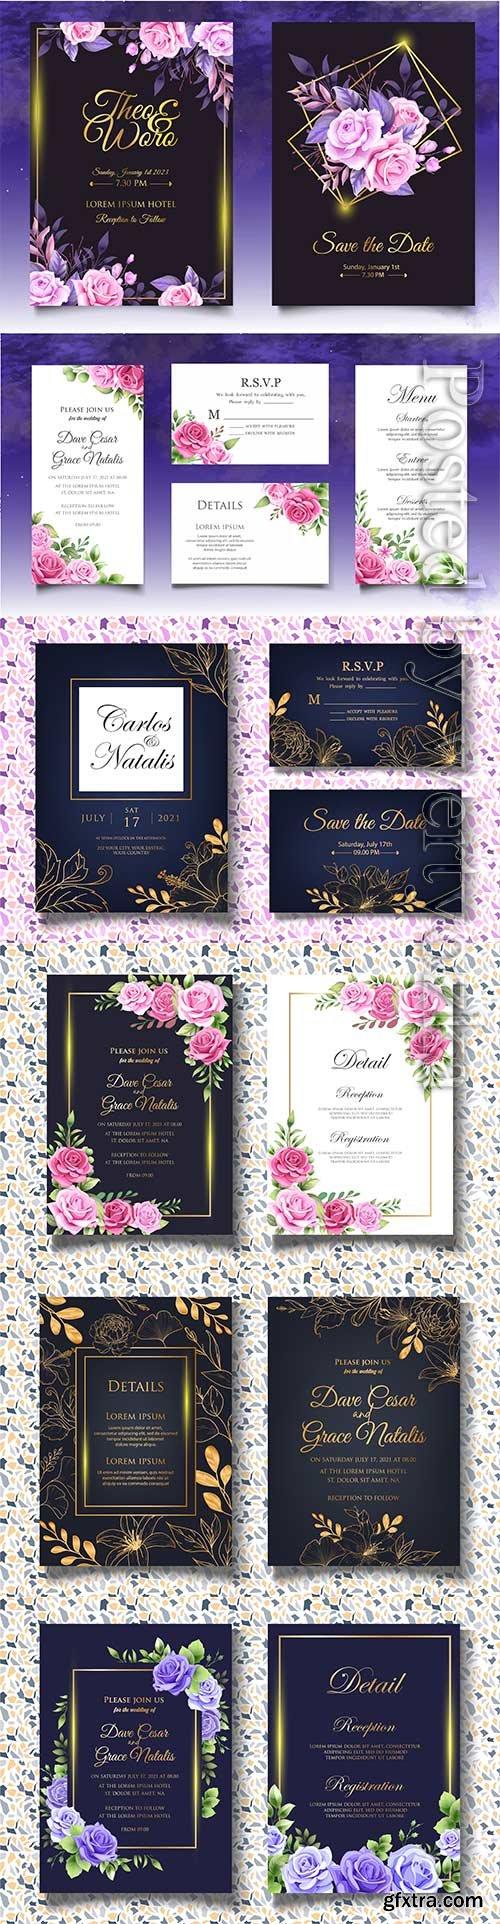 Vector floral wedding invitation template